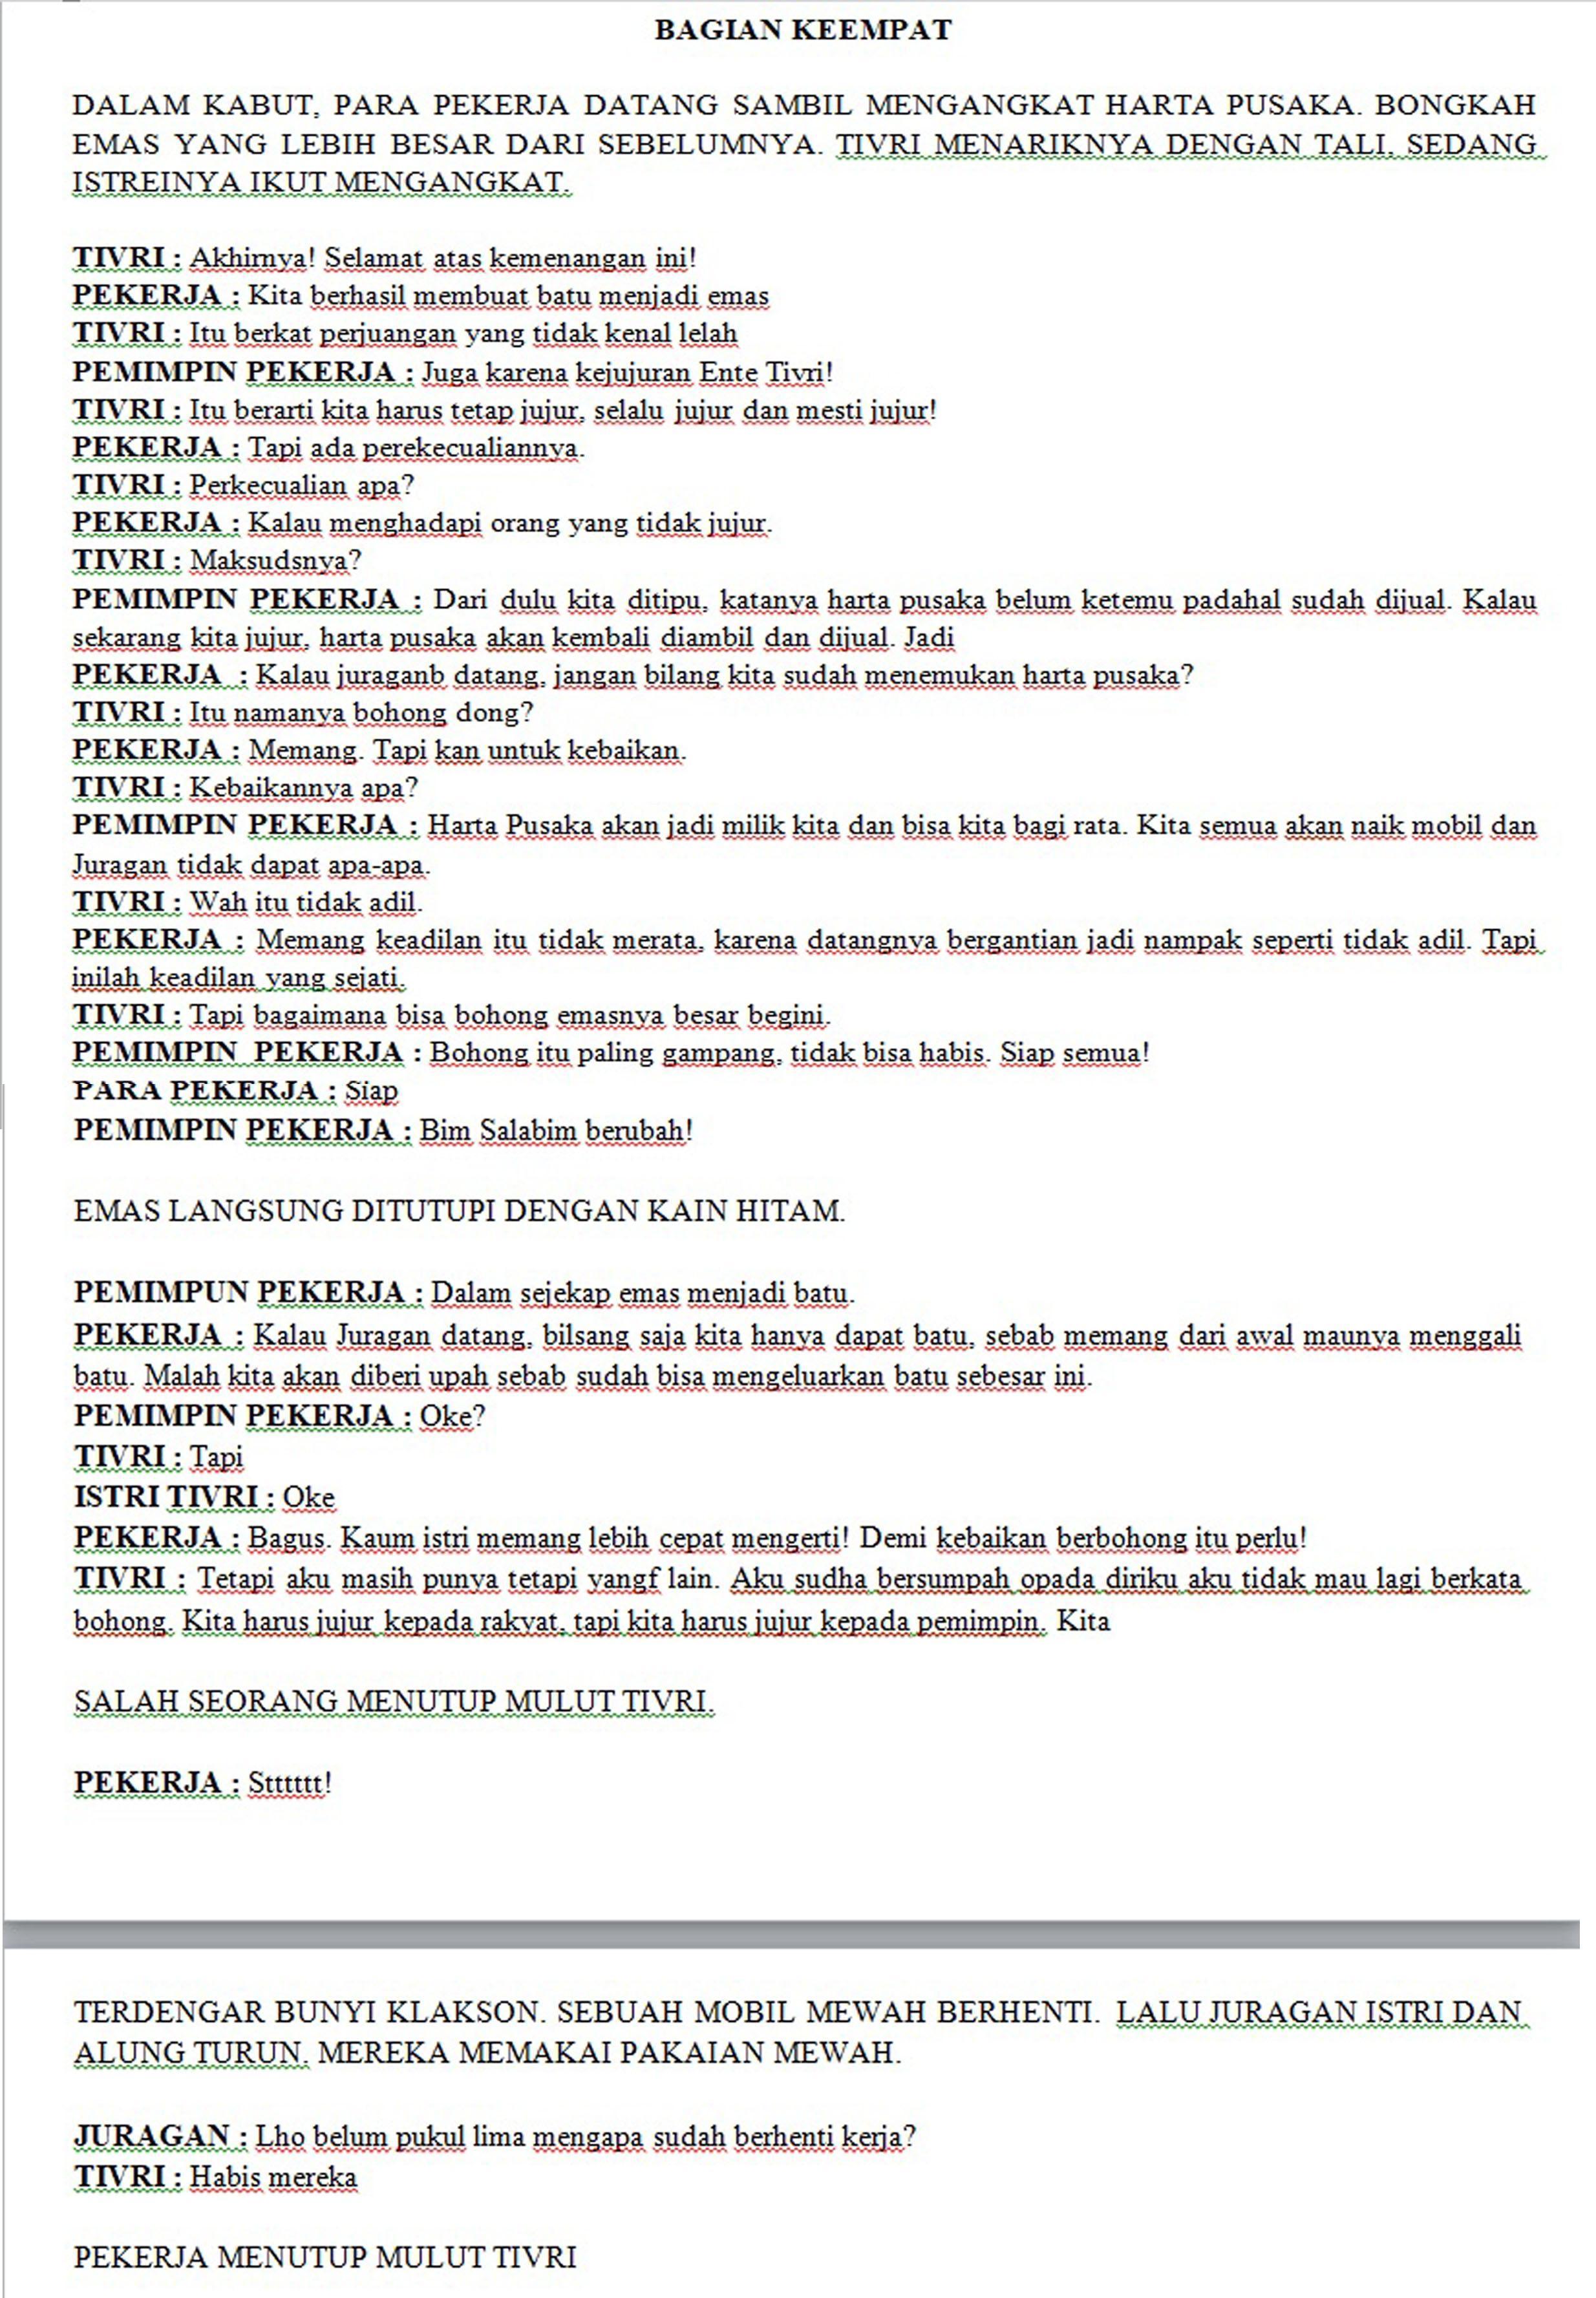 Contoh Drama Pendek Beserta Unsur Unsurnya : contoh, drama, pendek, beserta, unsur, unsurnya, TULISKAN, Unsur-unsur, Intrinsik, Drama, Cipoa, Karya, Wijaya, Bagian, Keempat., Brainly.co.id